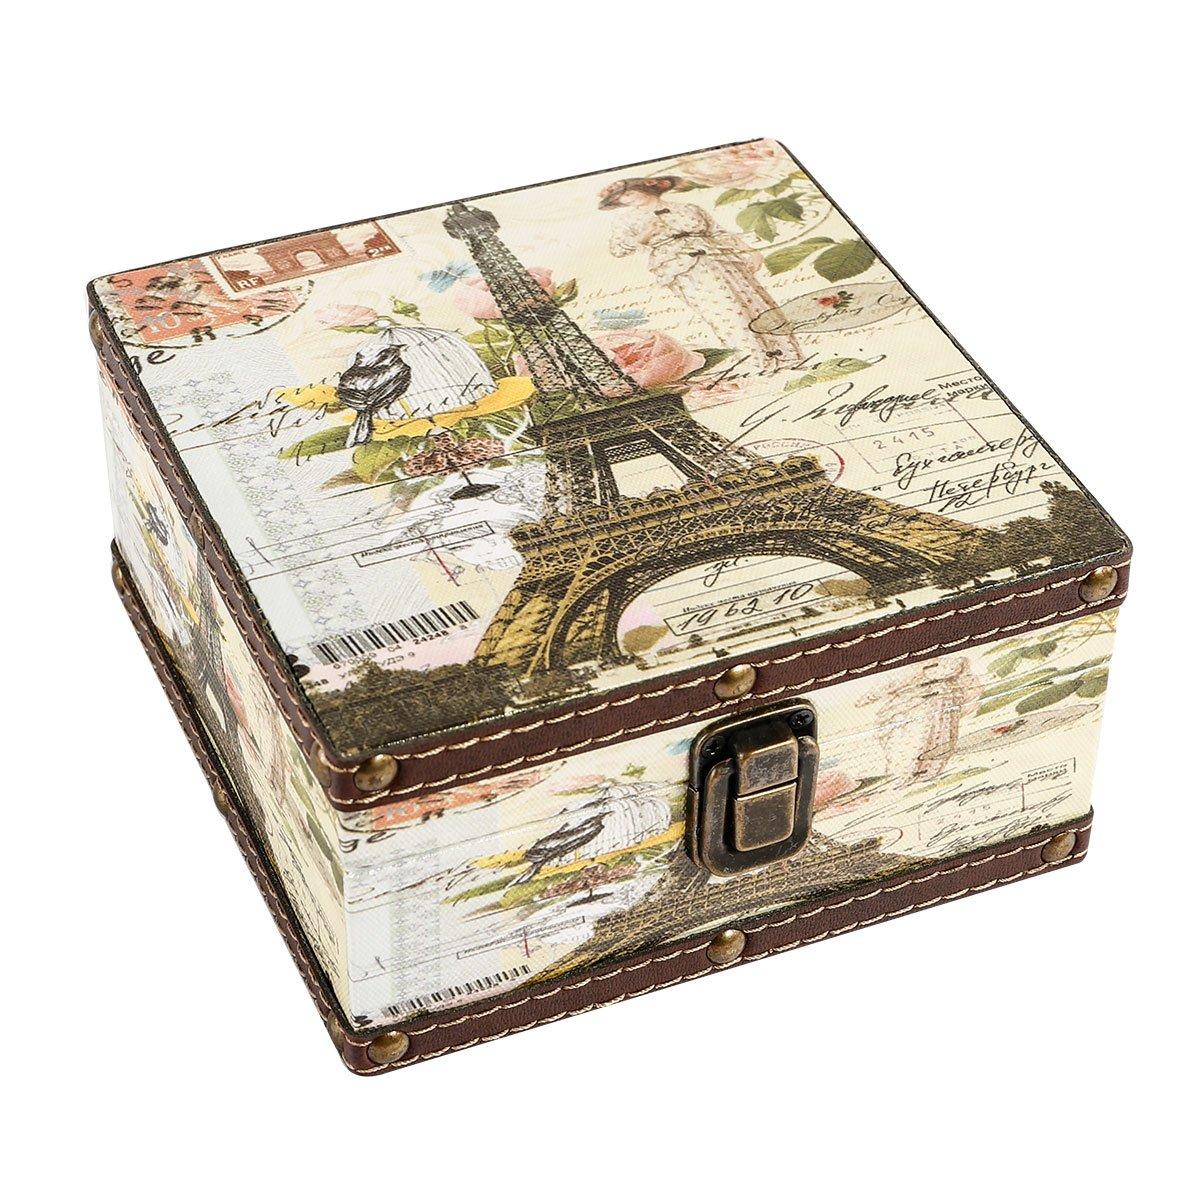 WaaHome Wood Jewelry Keepsake Storage Box Memory Boxes Eiffel Tower Decorative Boxes For Girls Kids, 6.4